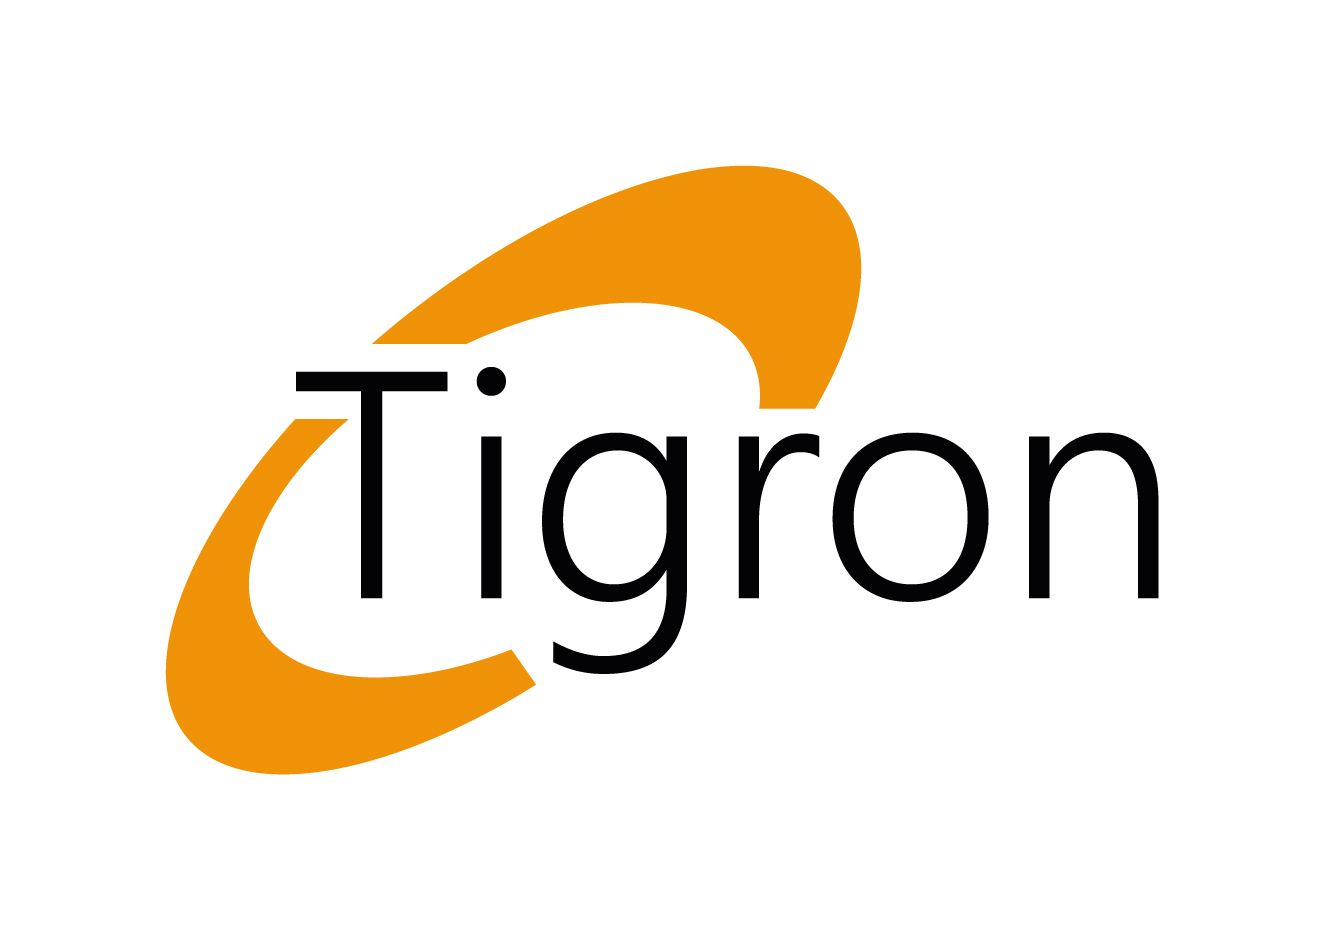 Tigron gaat groen met zonne-energie